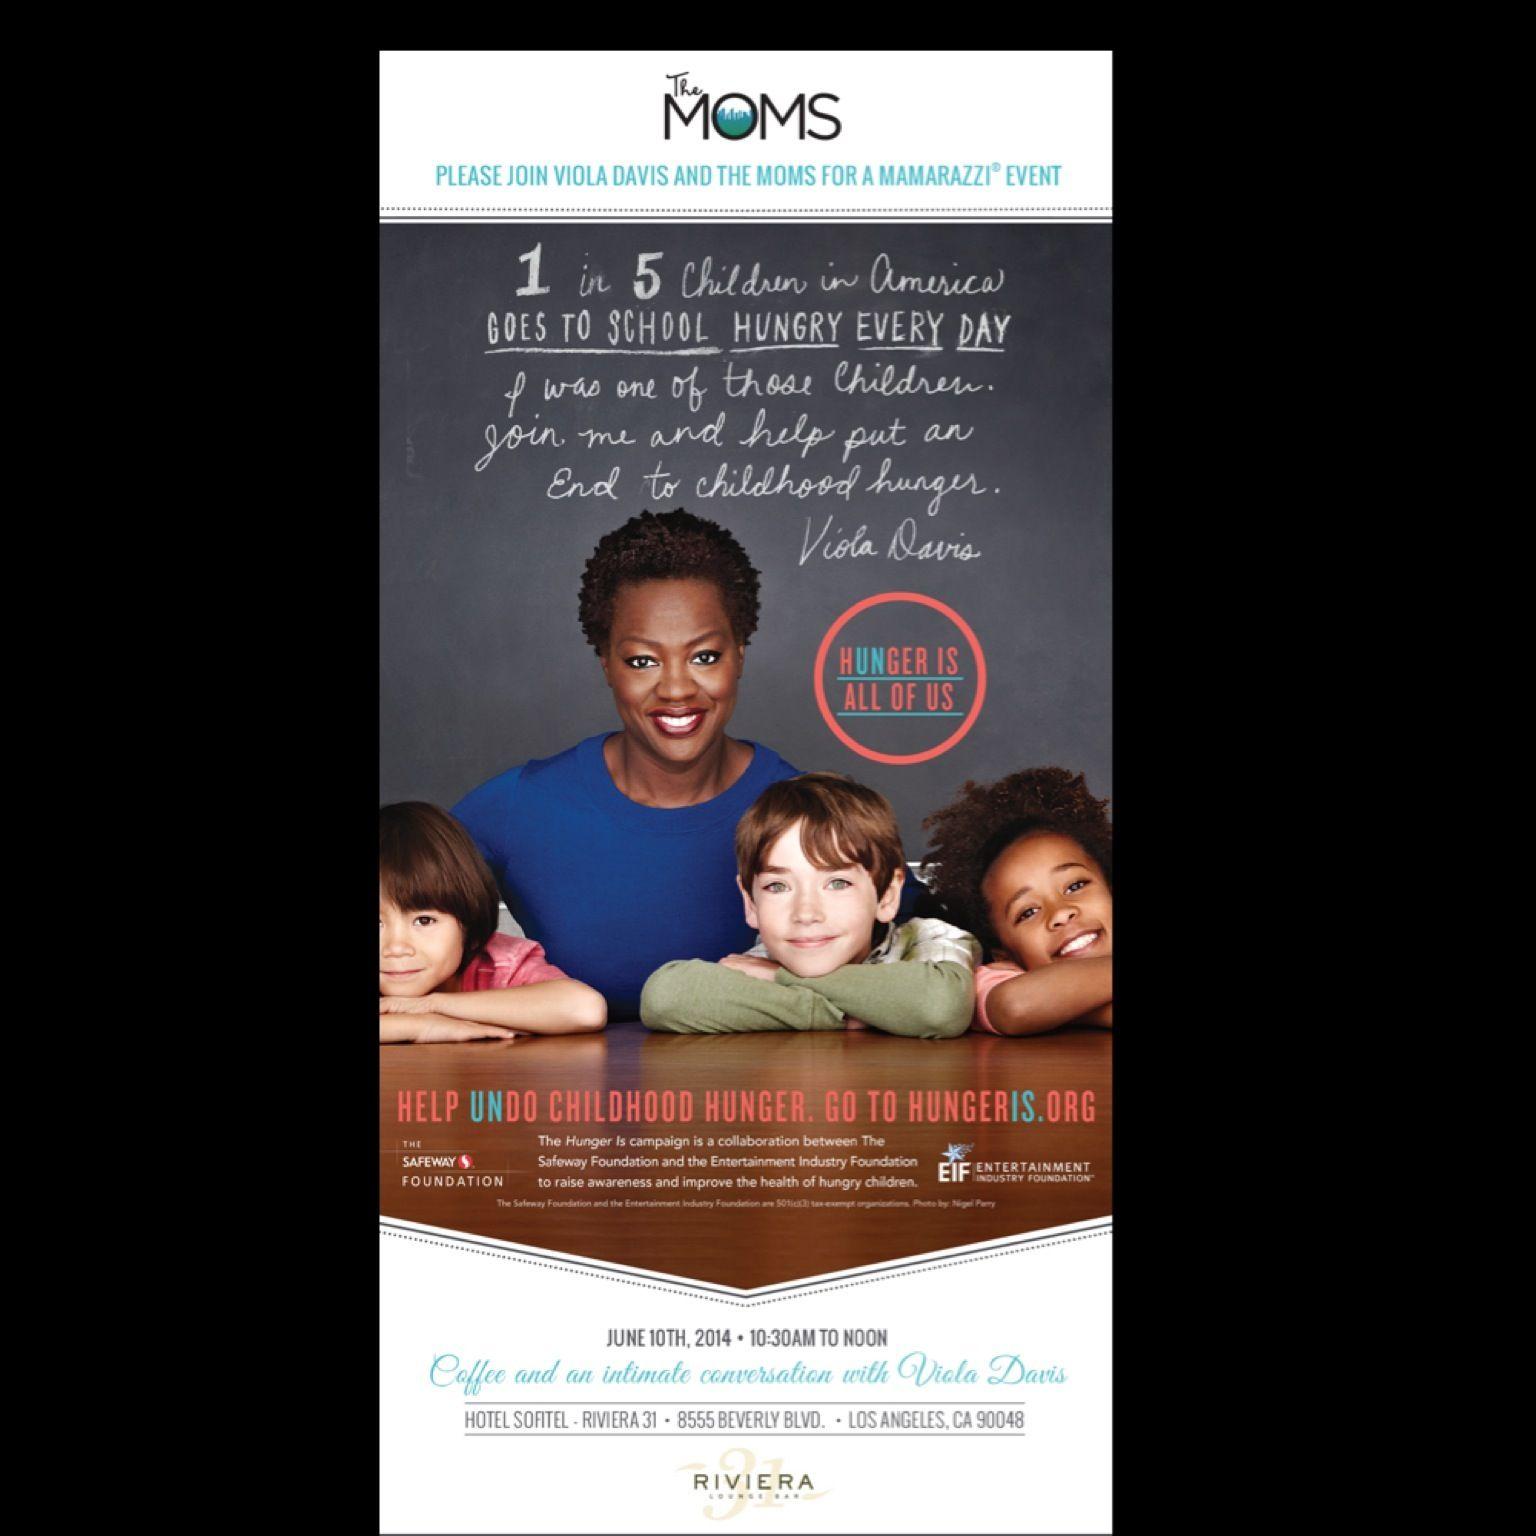 Viola Davis partners with Safeway,